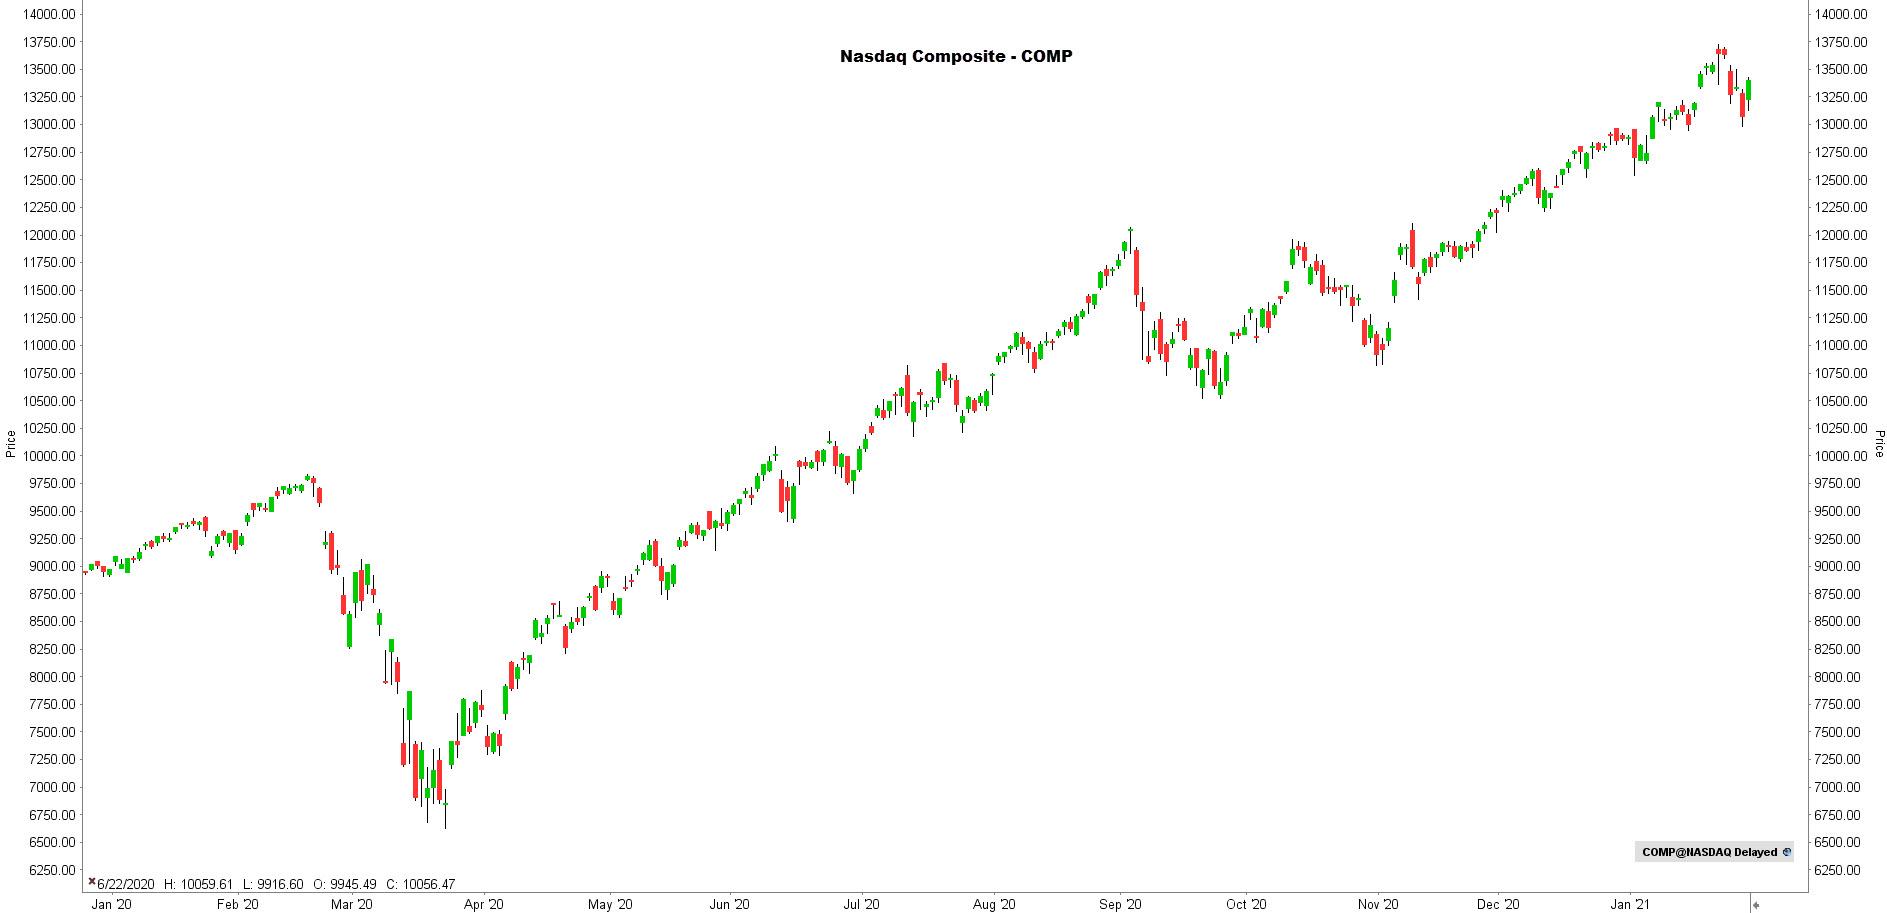 la chronique lynx broker 020221 - graphique Nasdaq